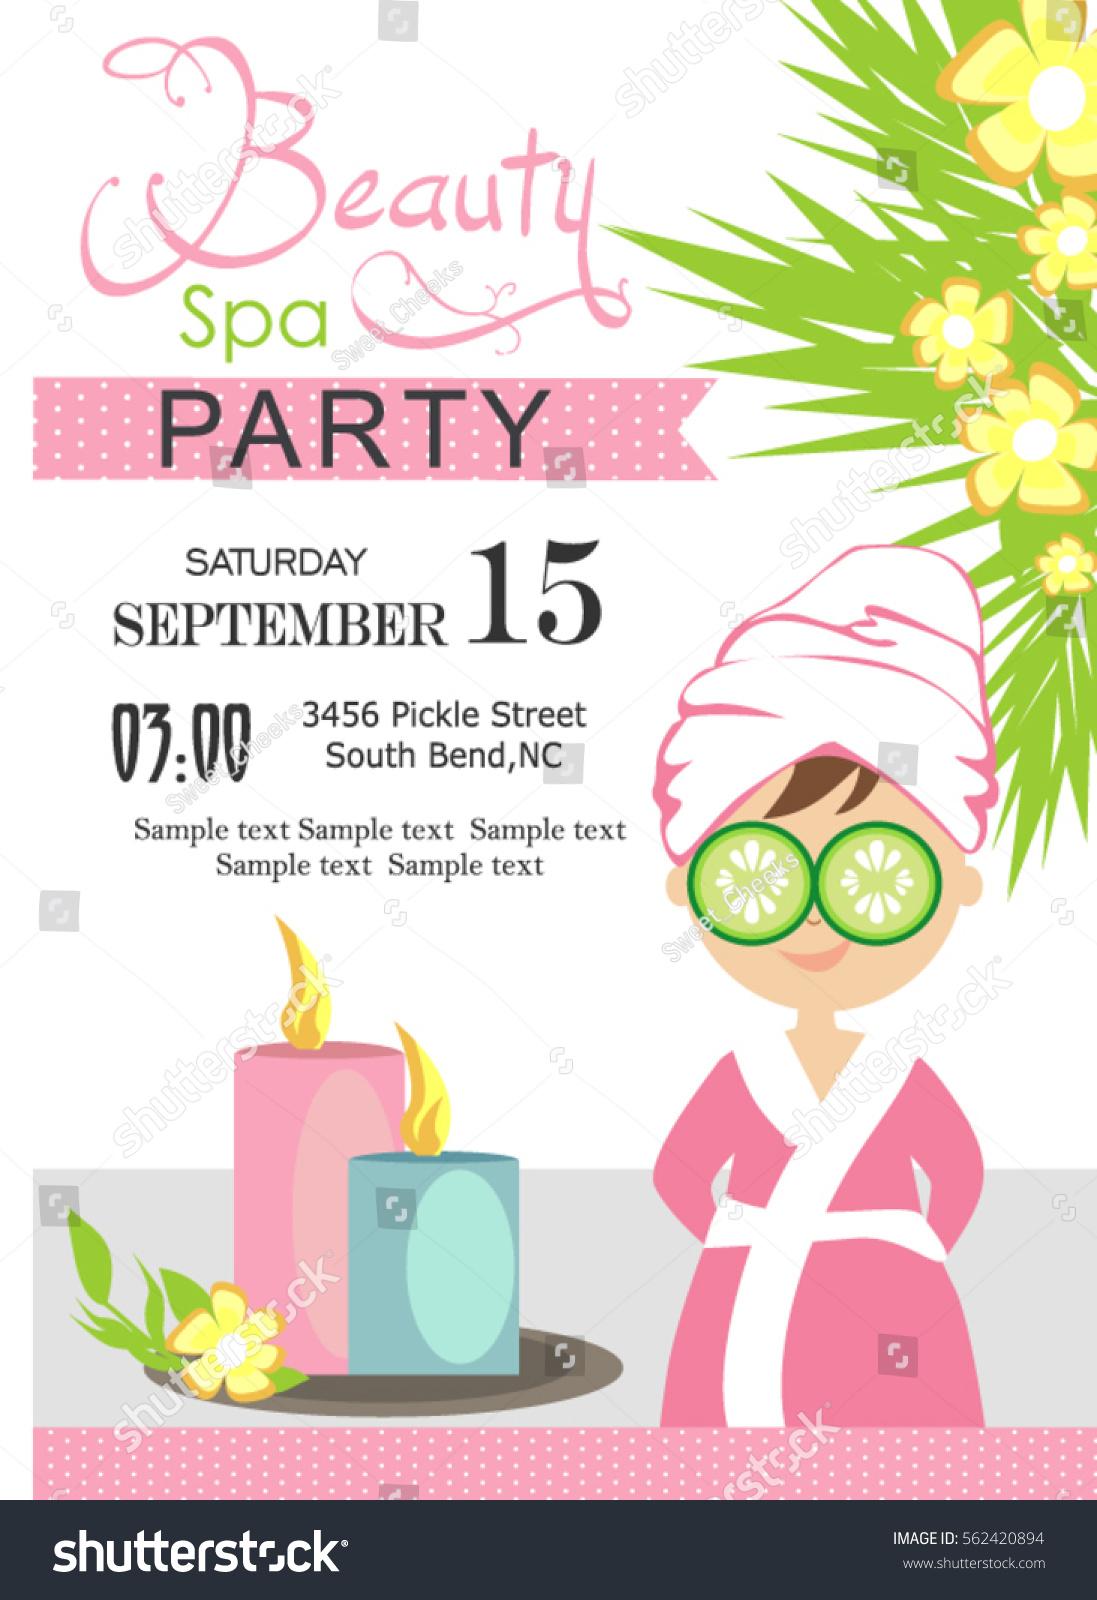 Spa Party Invitation Card Stock Vector 562420894 - Shutterstock